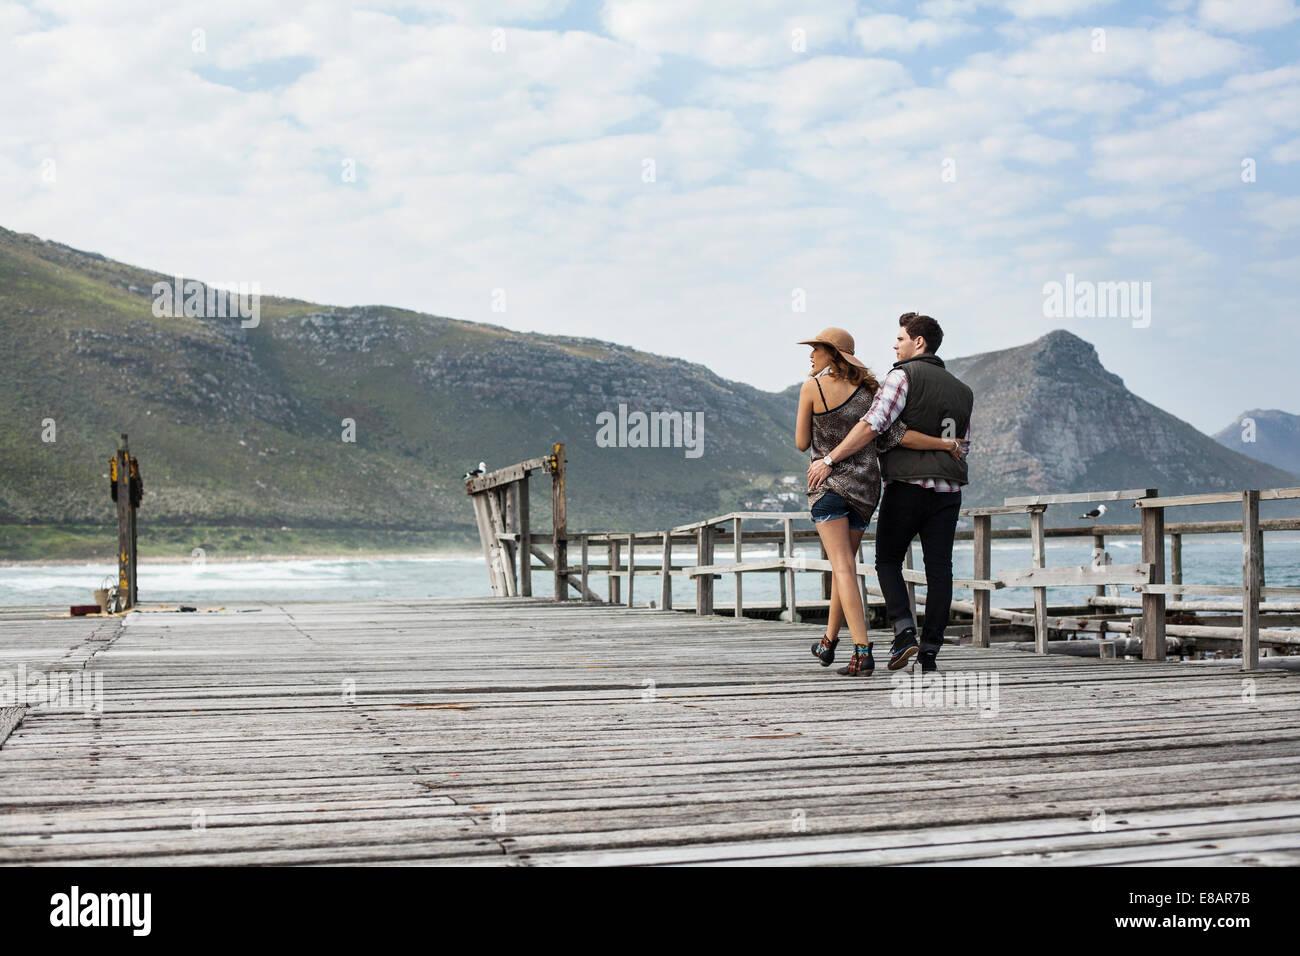 Junges Paar schlendern entlang alten Pier, Cape Town, Western Cape, Südafrika Stockfoto